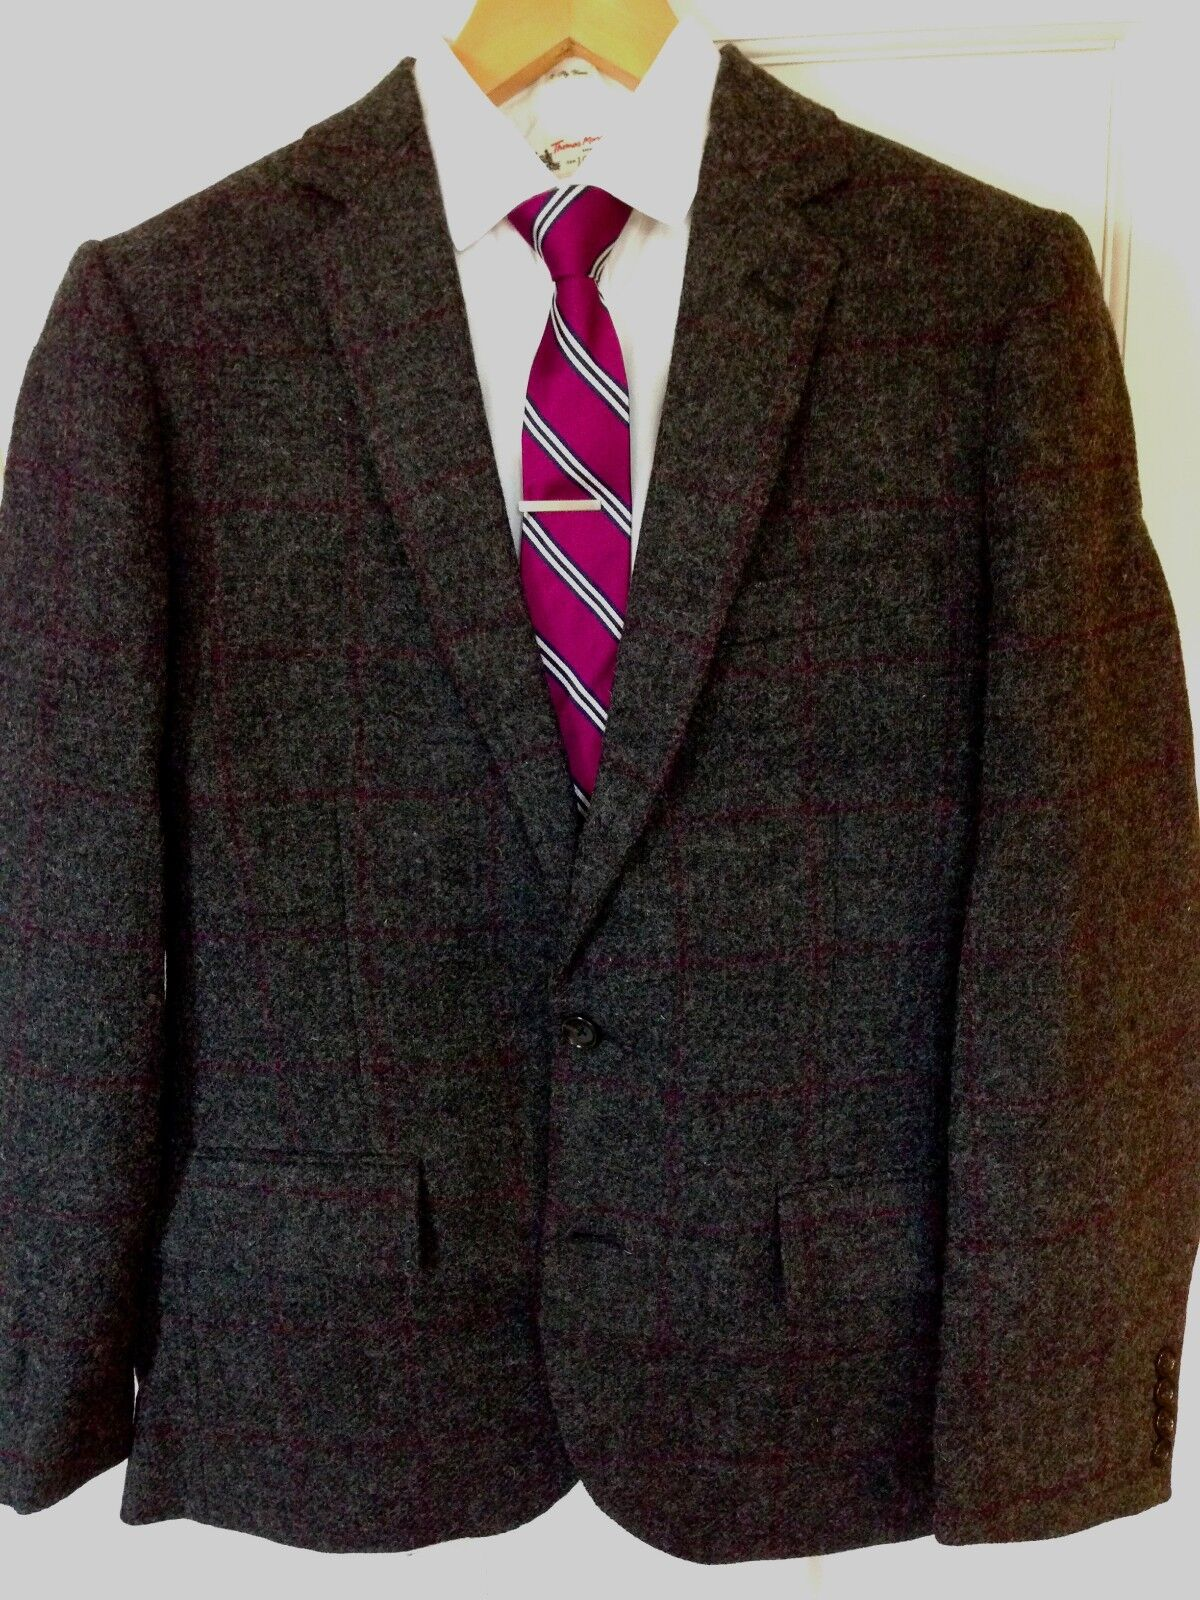 NWT J Crew Ludlow Sportcoat in Windowpane English Wool - Charcoal Size 40S